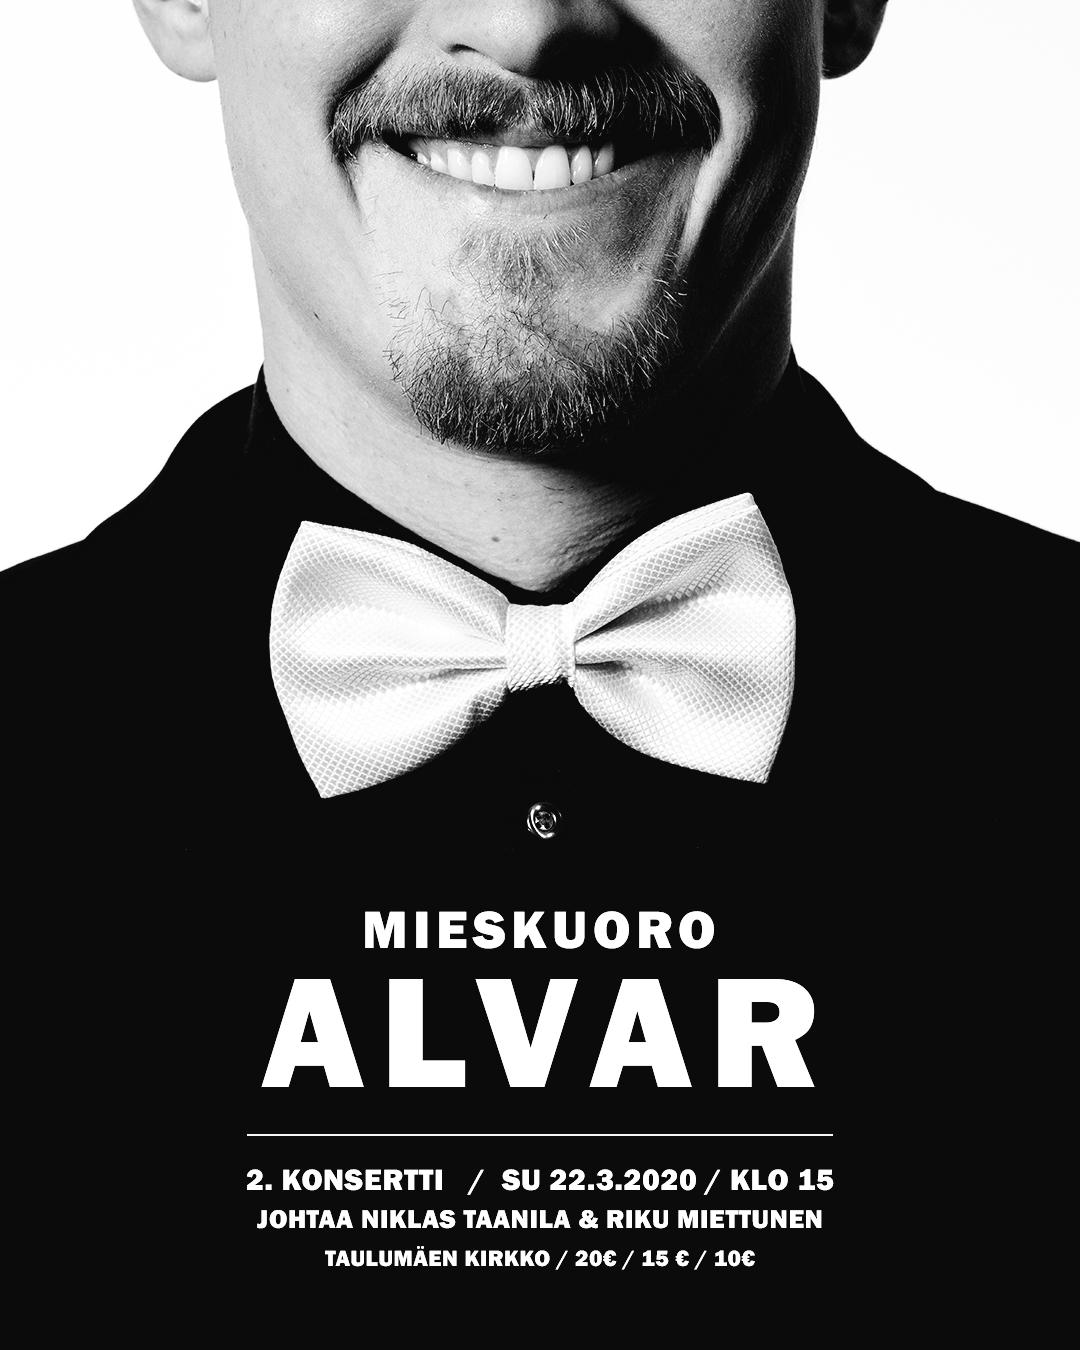 2020 03 08 Mieskuoro Alvari juliste, 2.konsertti, Instagram kuva 2.2